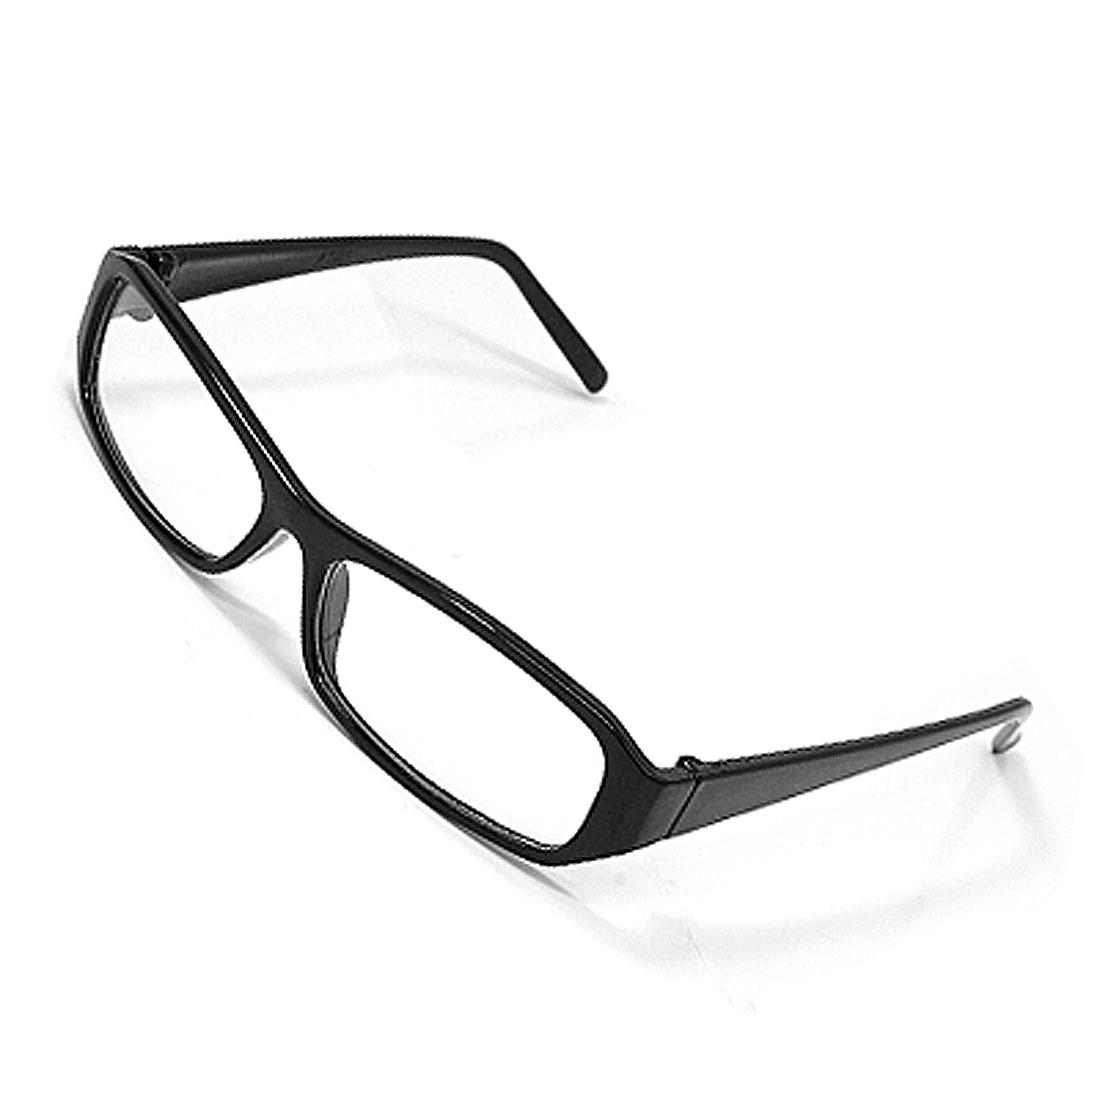 Clear Lens Black Plastic Frame Elegant Chic Sunglasses